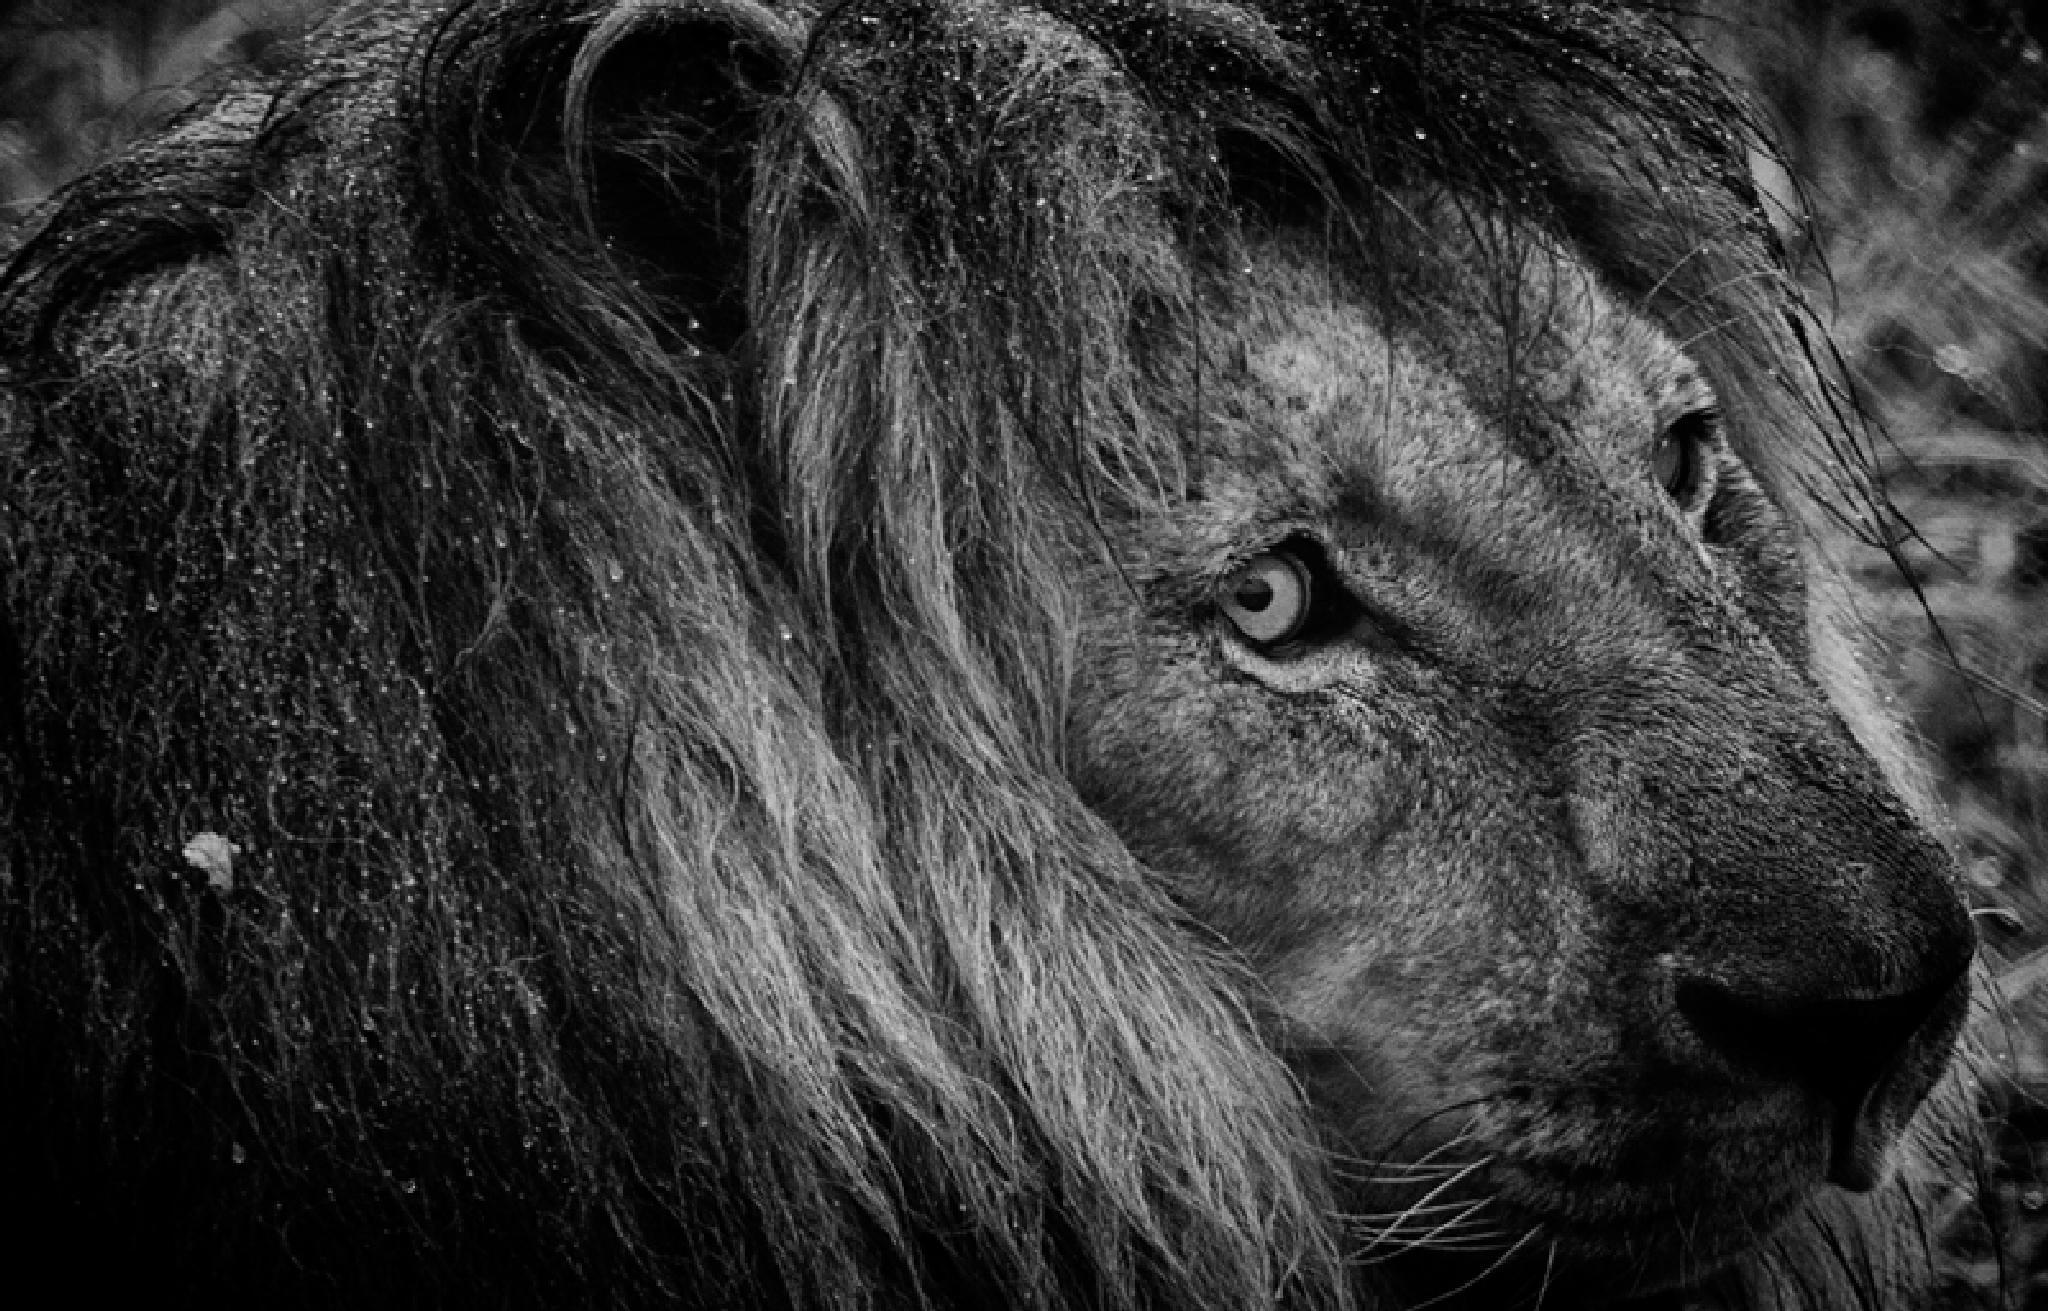 Hilane Lion by bharat patel